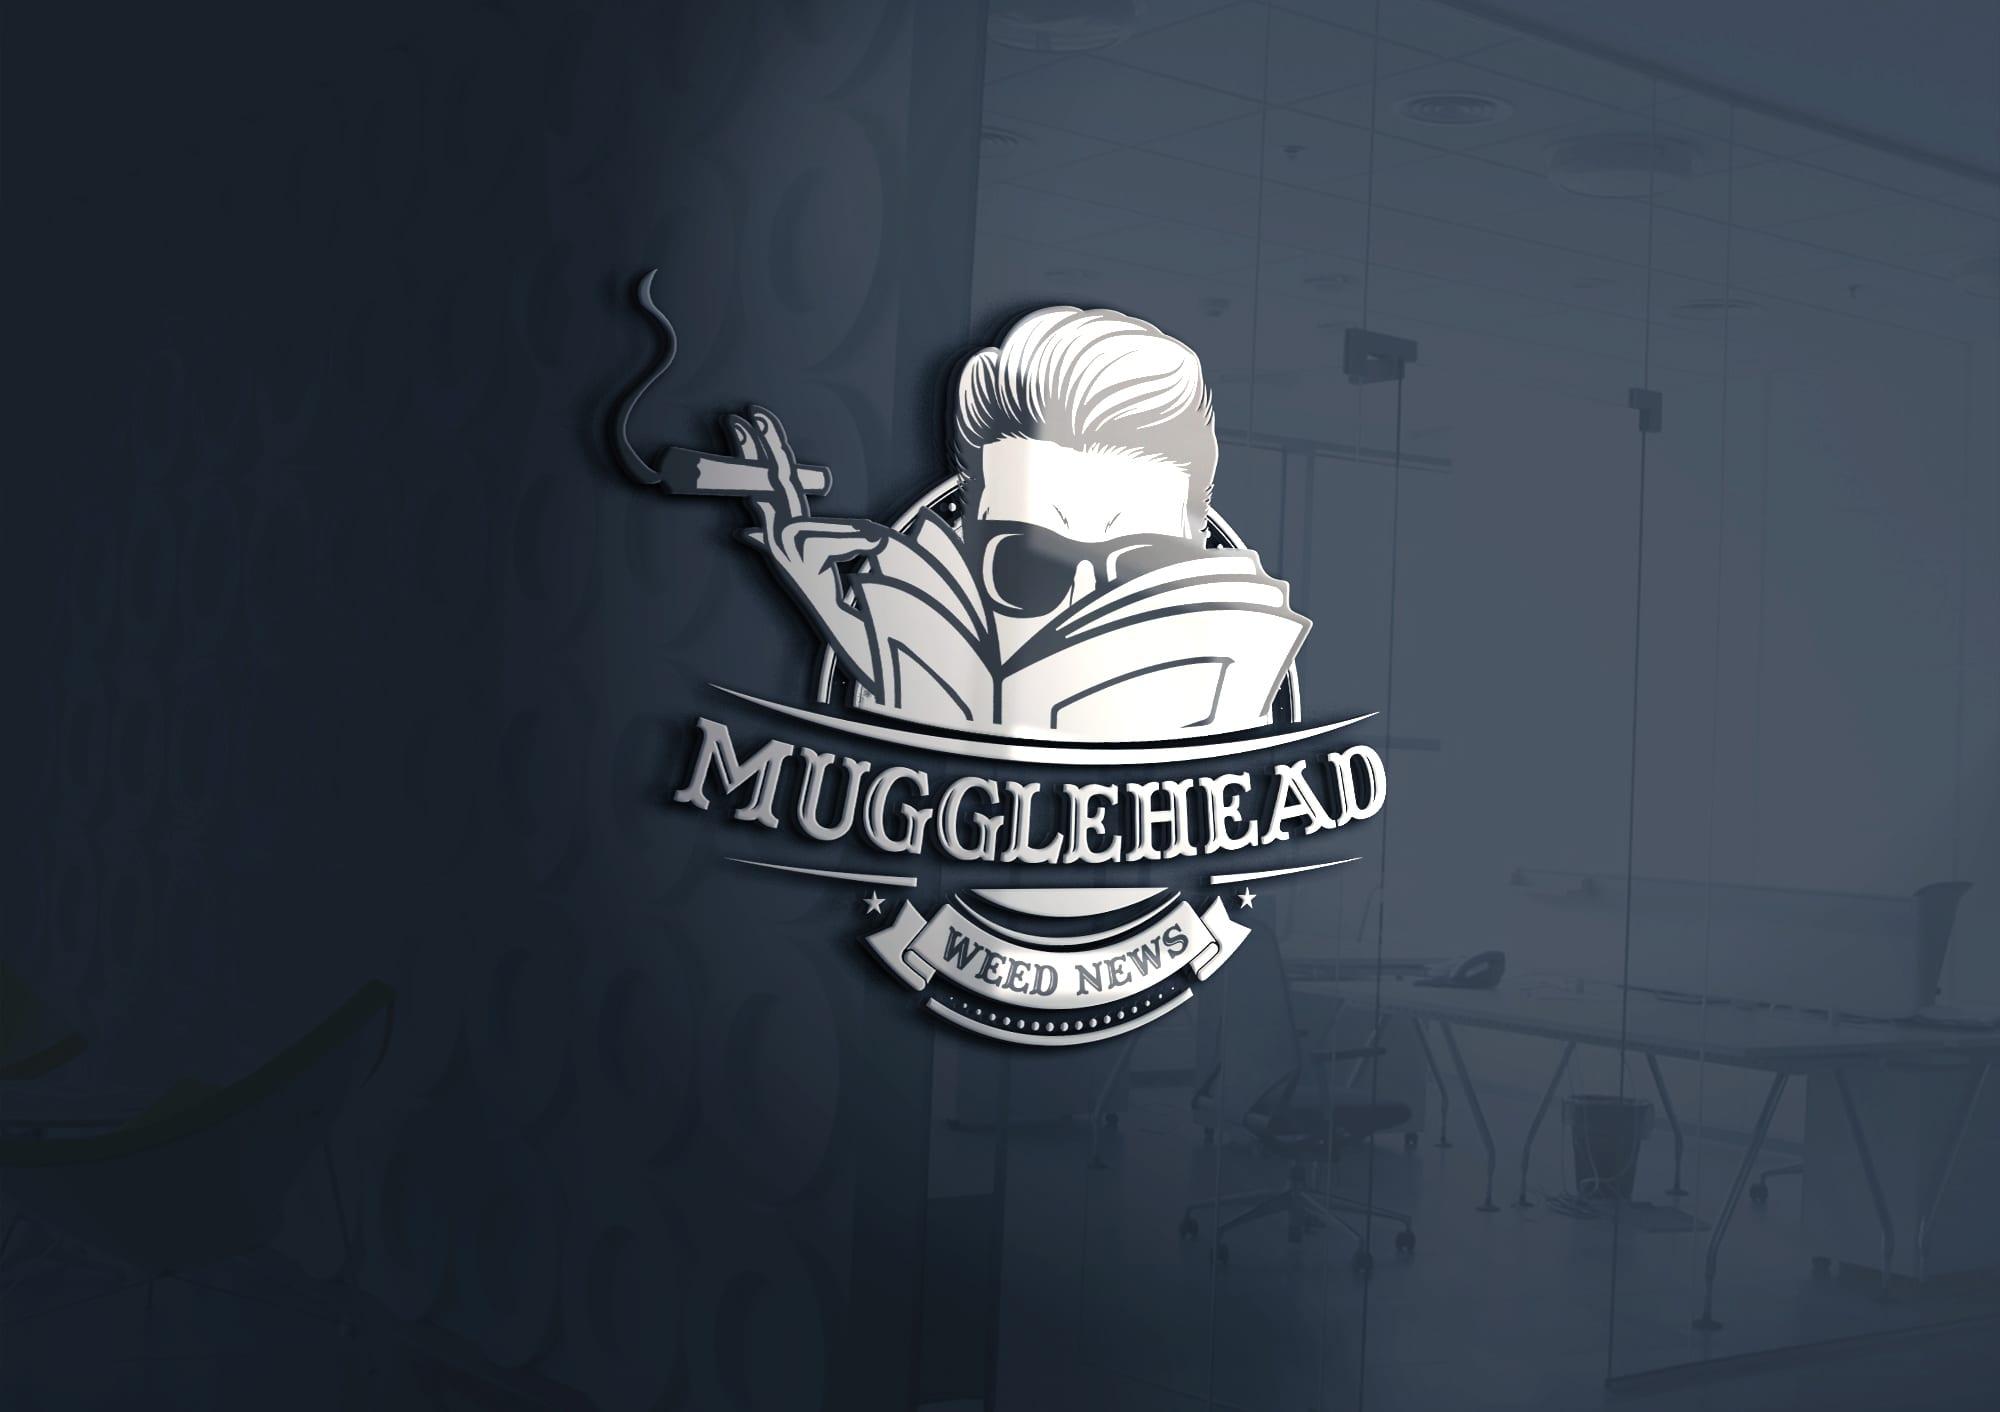 Mugglehead logo